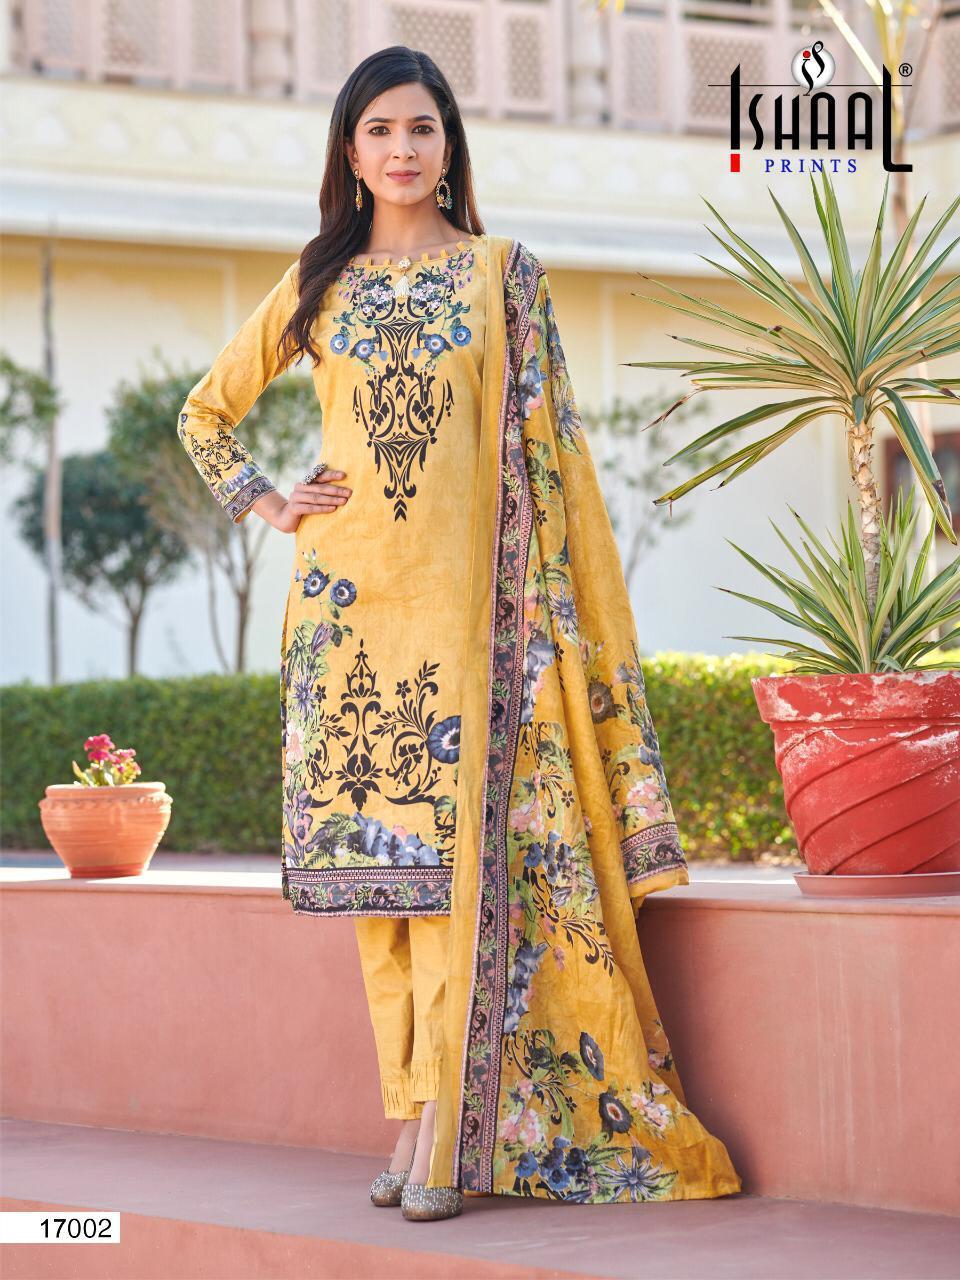 Ishaal Gulmohar Vol 17 Salwar Suit Wholesale Catalog 10 Pcs 1 - Ishaal Gulmohar Vol 17 Salwar Suit Wholesale Catalog 10 Pcs